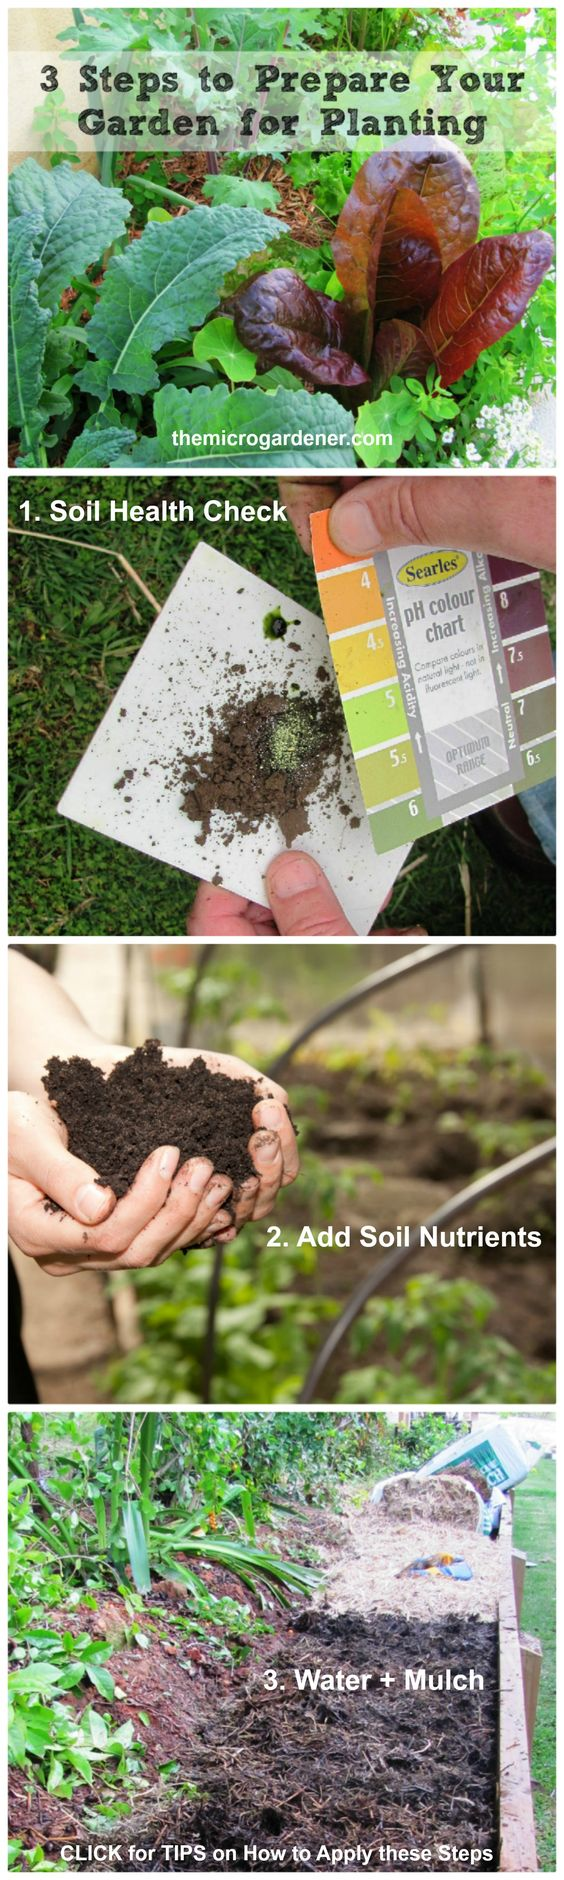 gardening g s gardening and more starting a garden plants gardens need